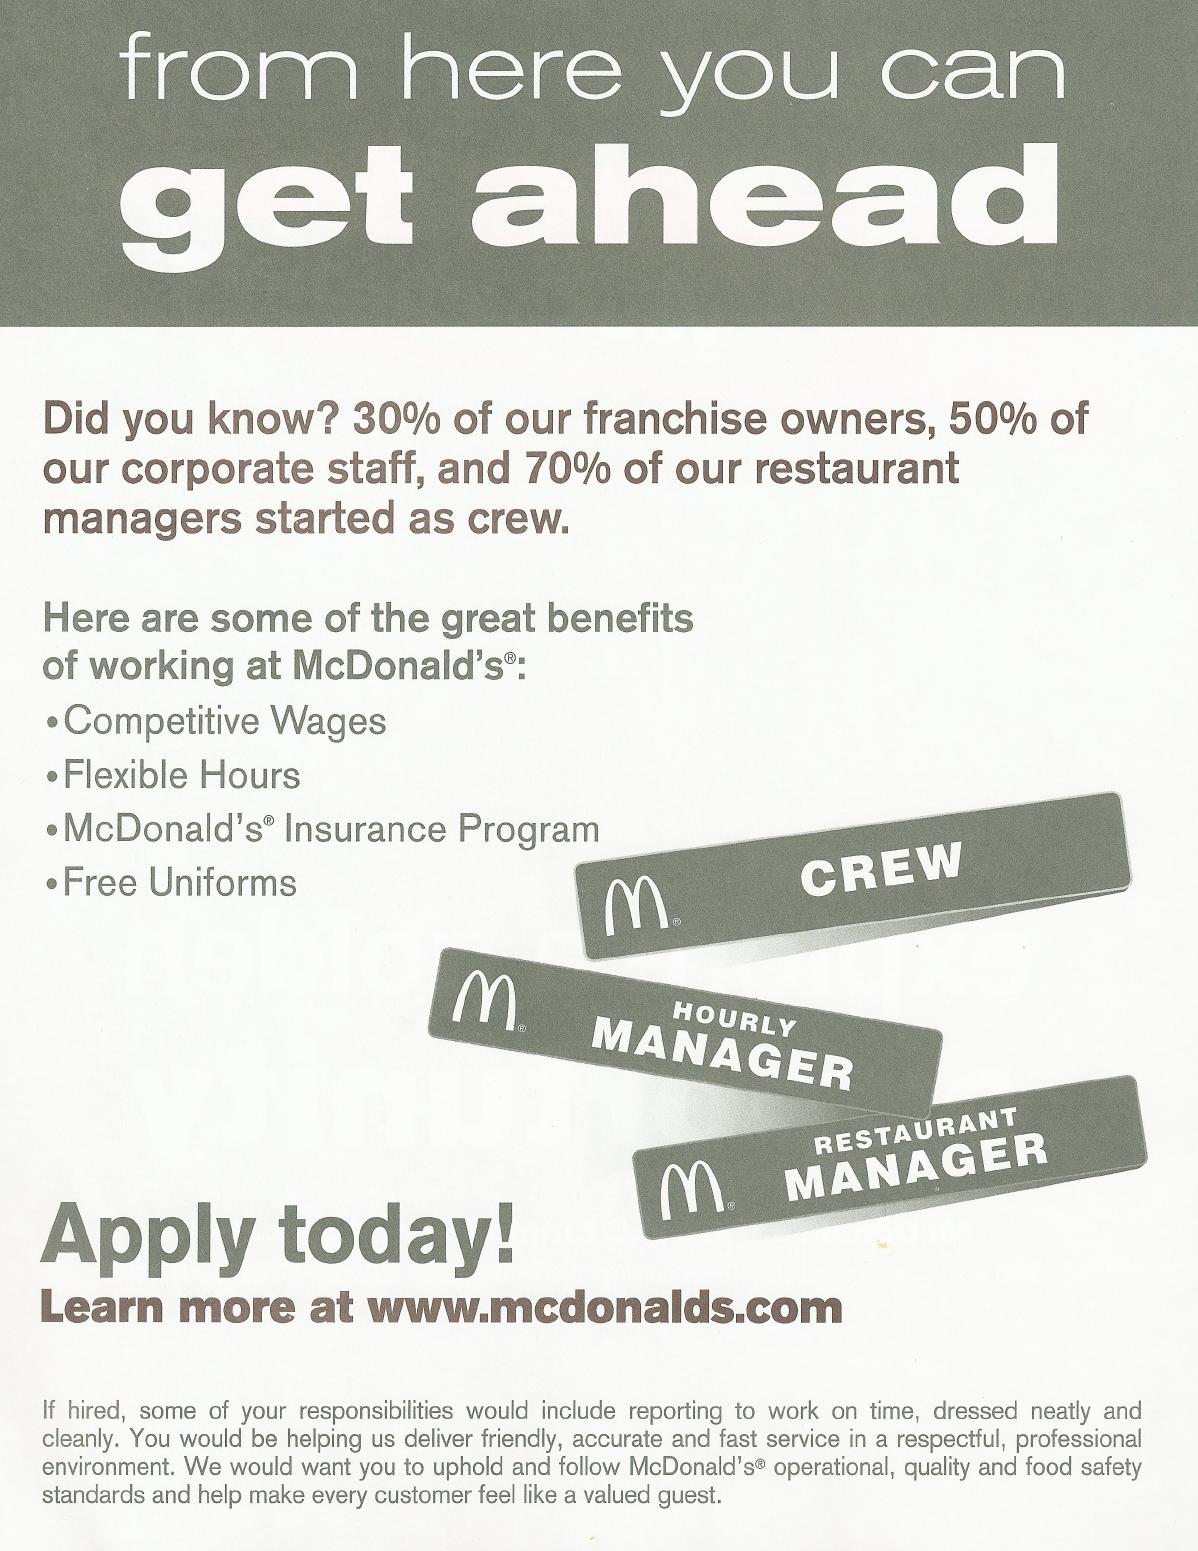 mcdonalds online application form uk